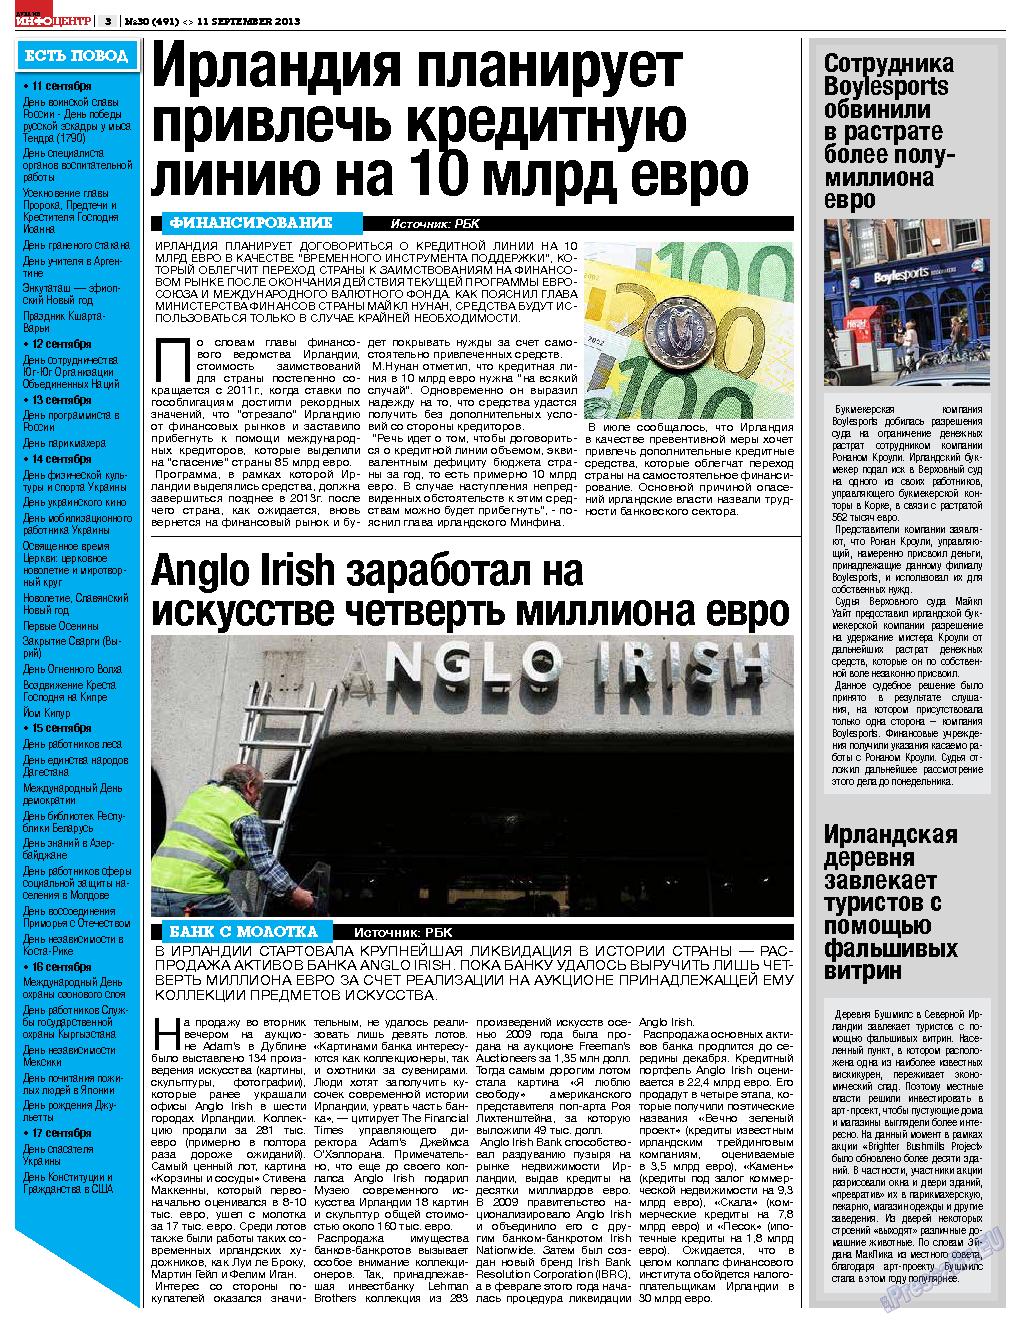 Дублин инфоцентр (газета). 2013 год, номер 30, стр. 3